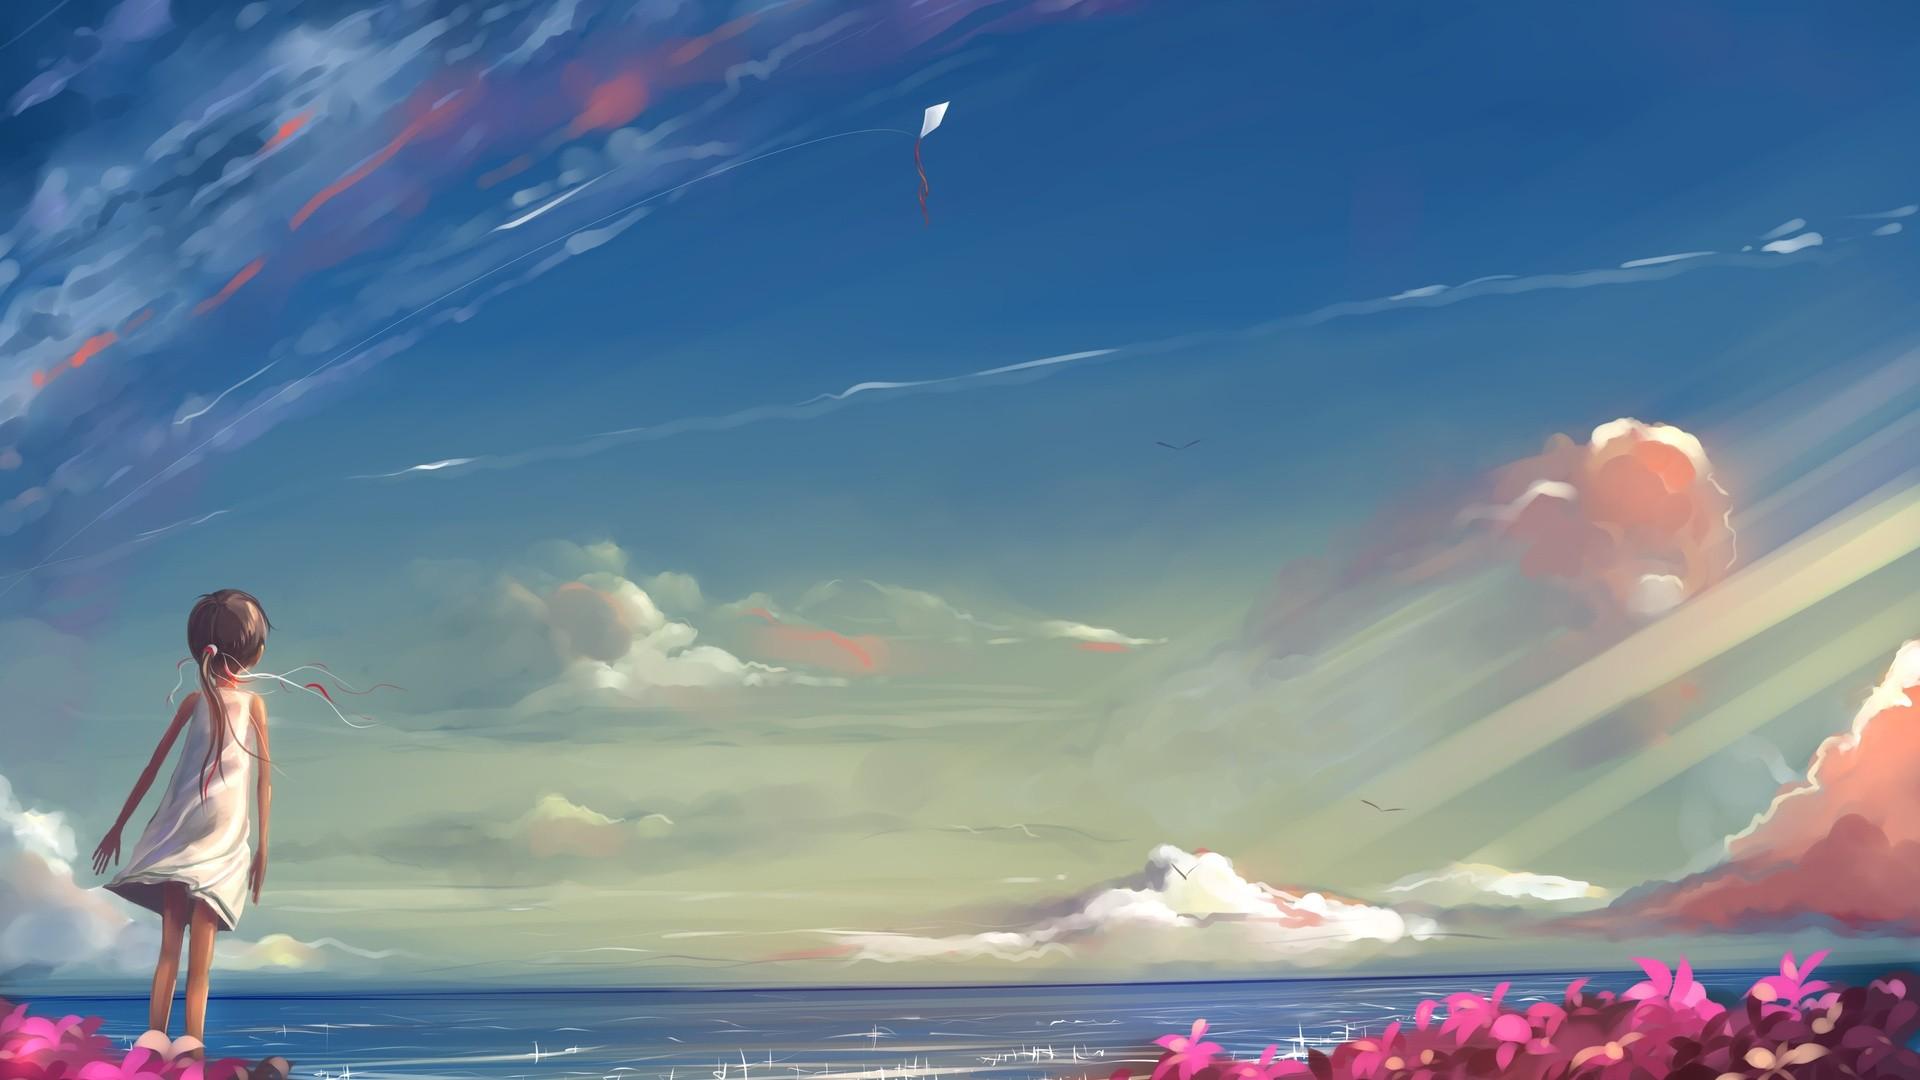 Anime Clouds PC Wallpaper HD